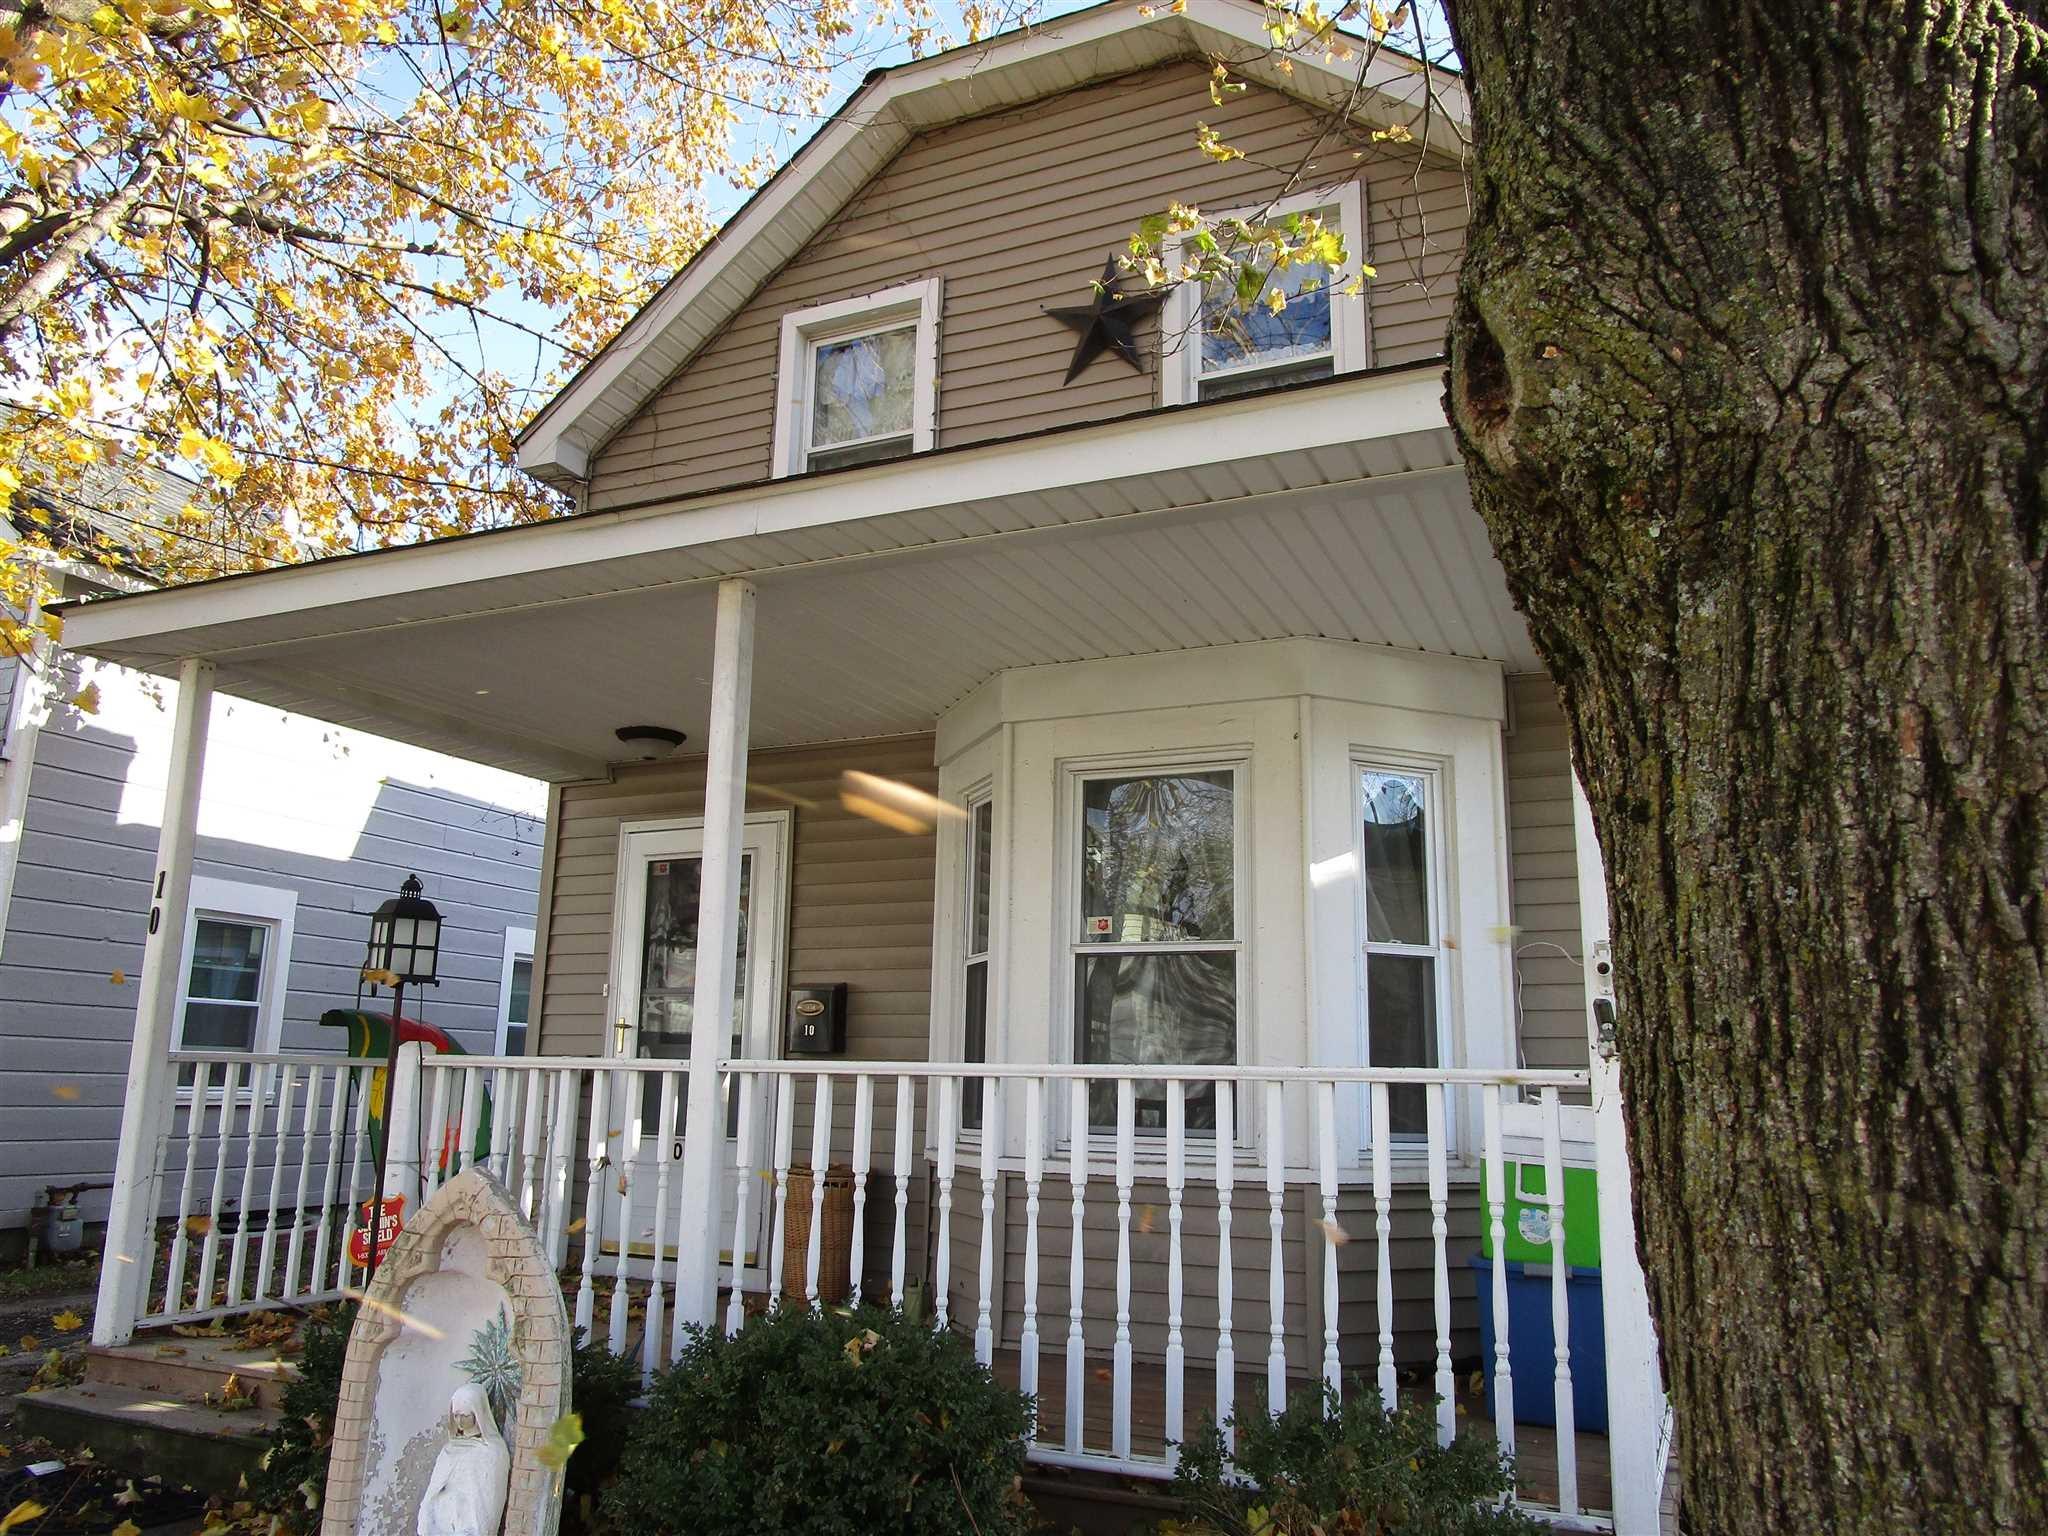 Single Family Home for Sale at 10 WALNUT Street 10 WALNUT Street Beacon, New York 12508 United States